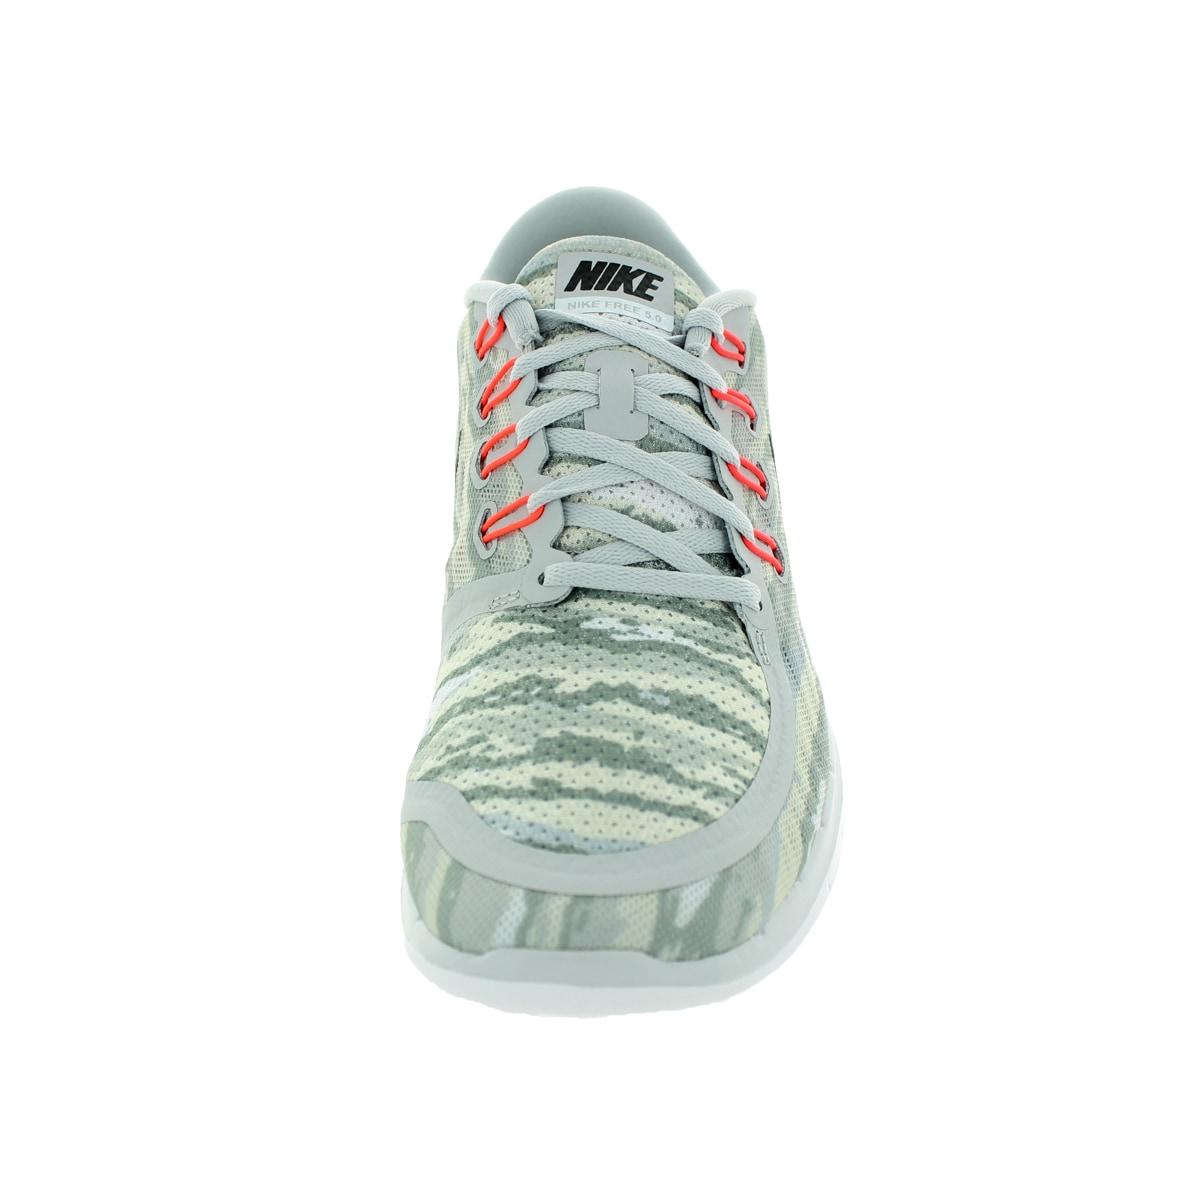 online retailer 1e9f3 fc8da Shop Nike Men s Free 5.0 Print Pure Platinum Black Hot Lava Running Shoe -  Free Shipping Today - Overstock - 12118857